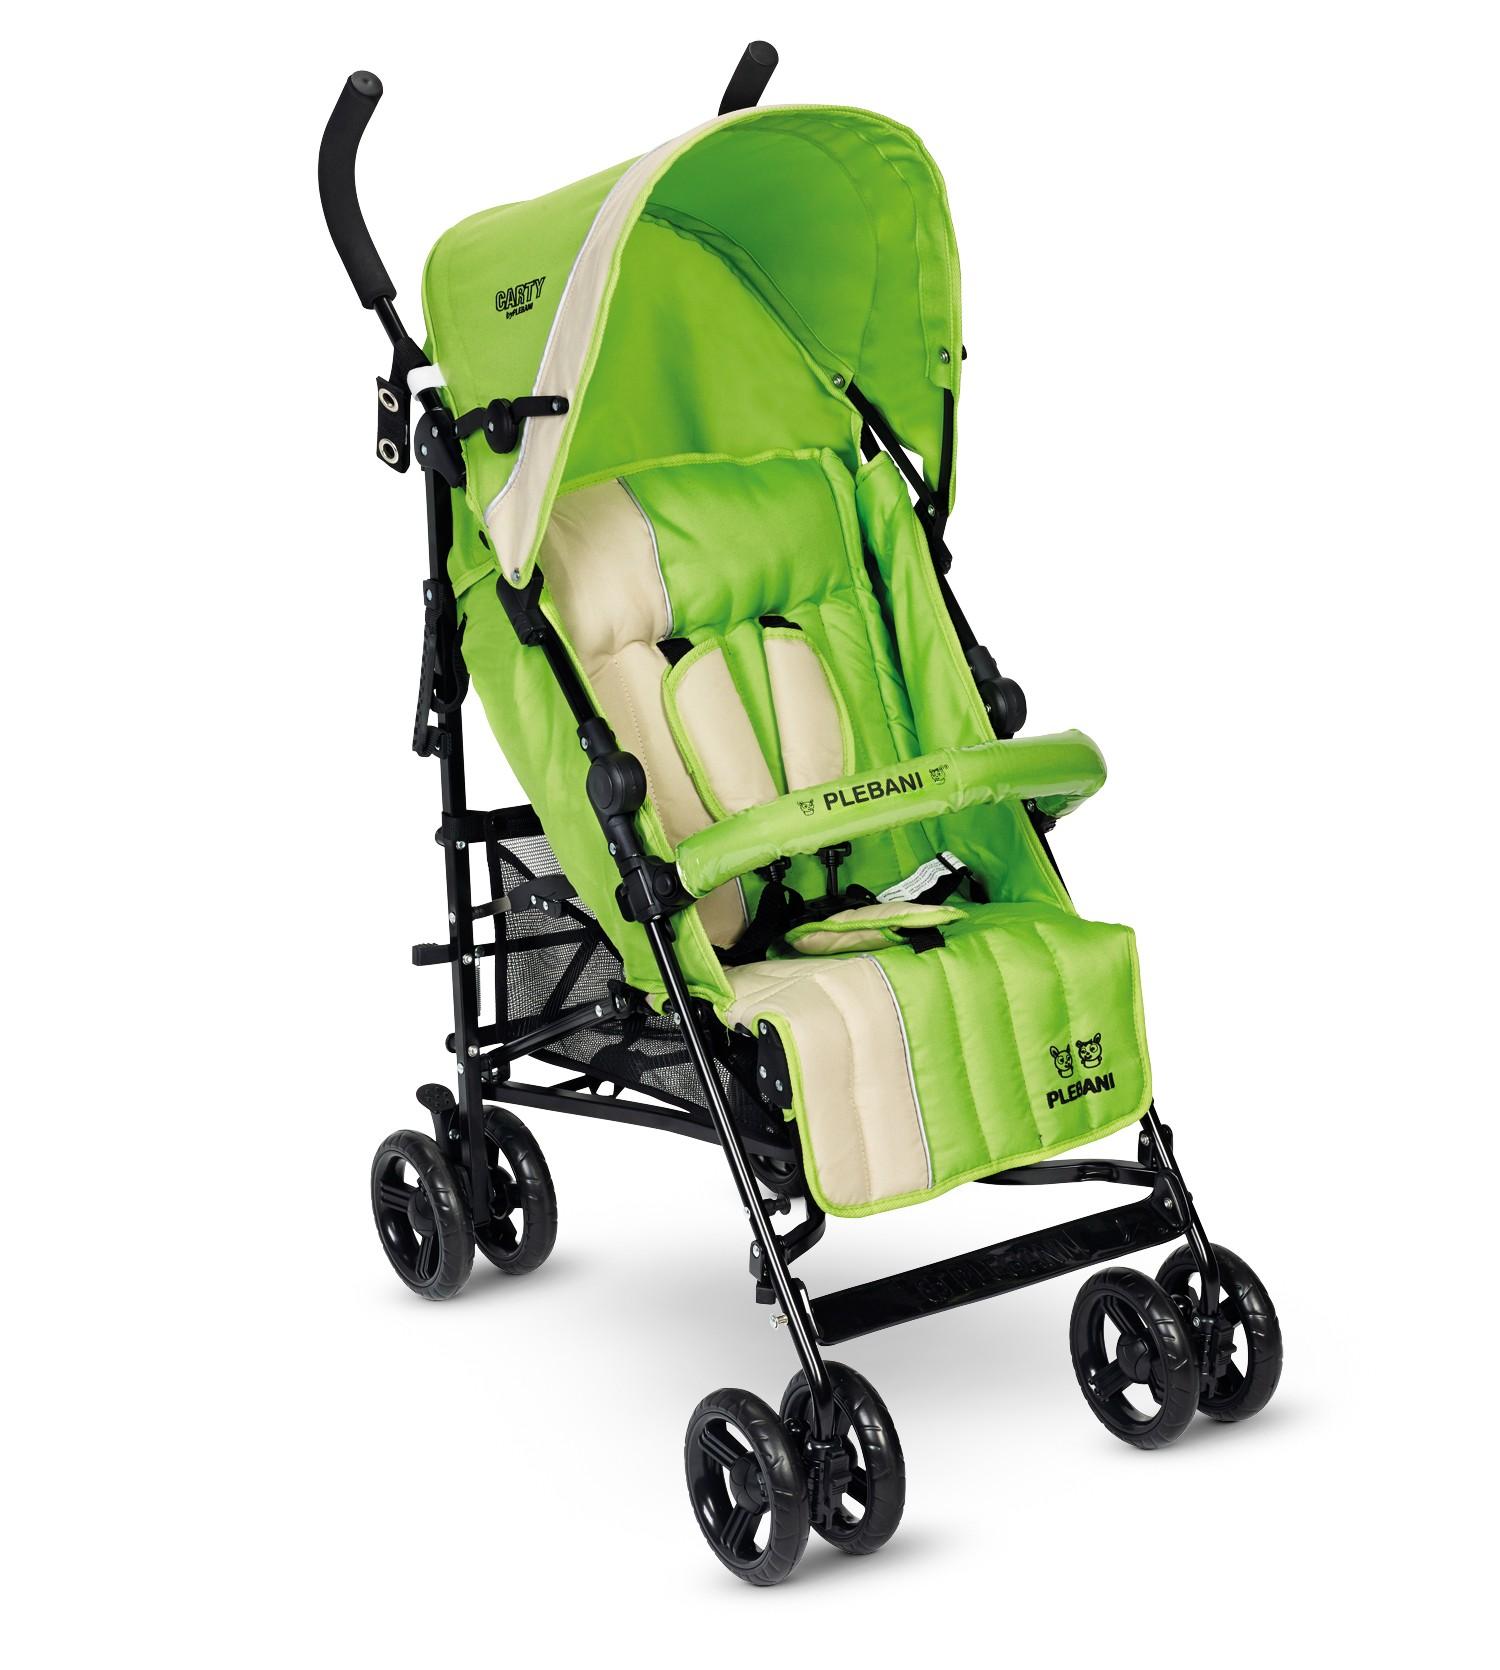 Poussette Carty Plebani Vert